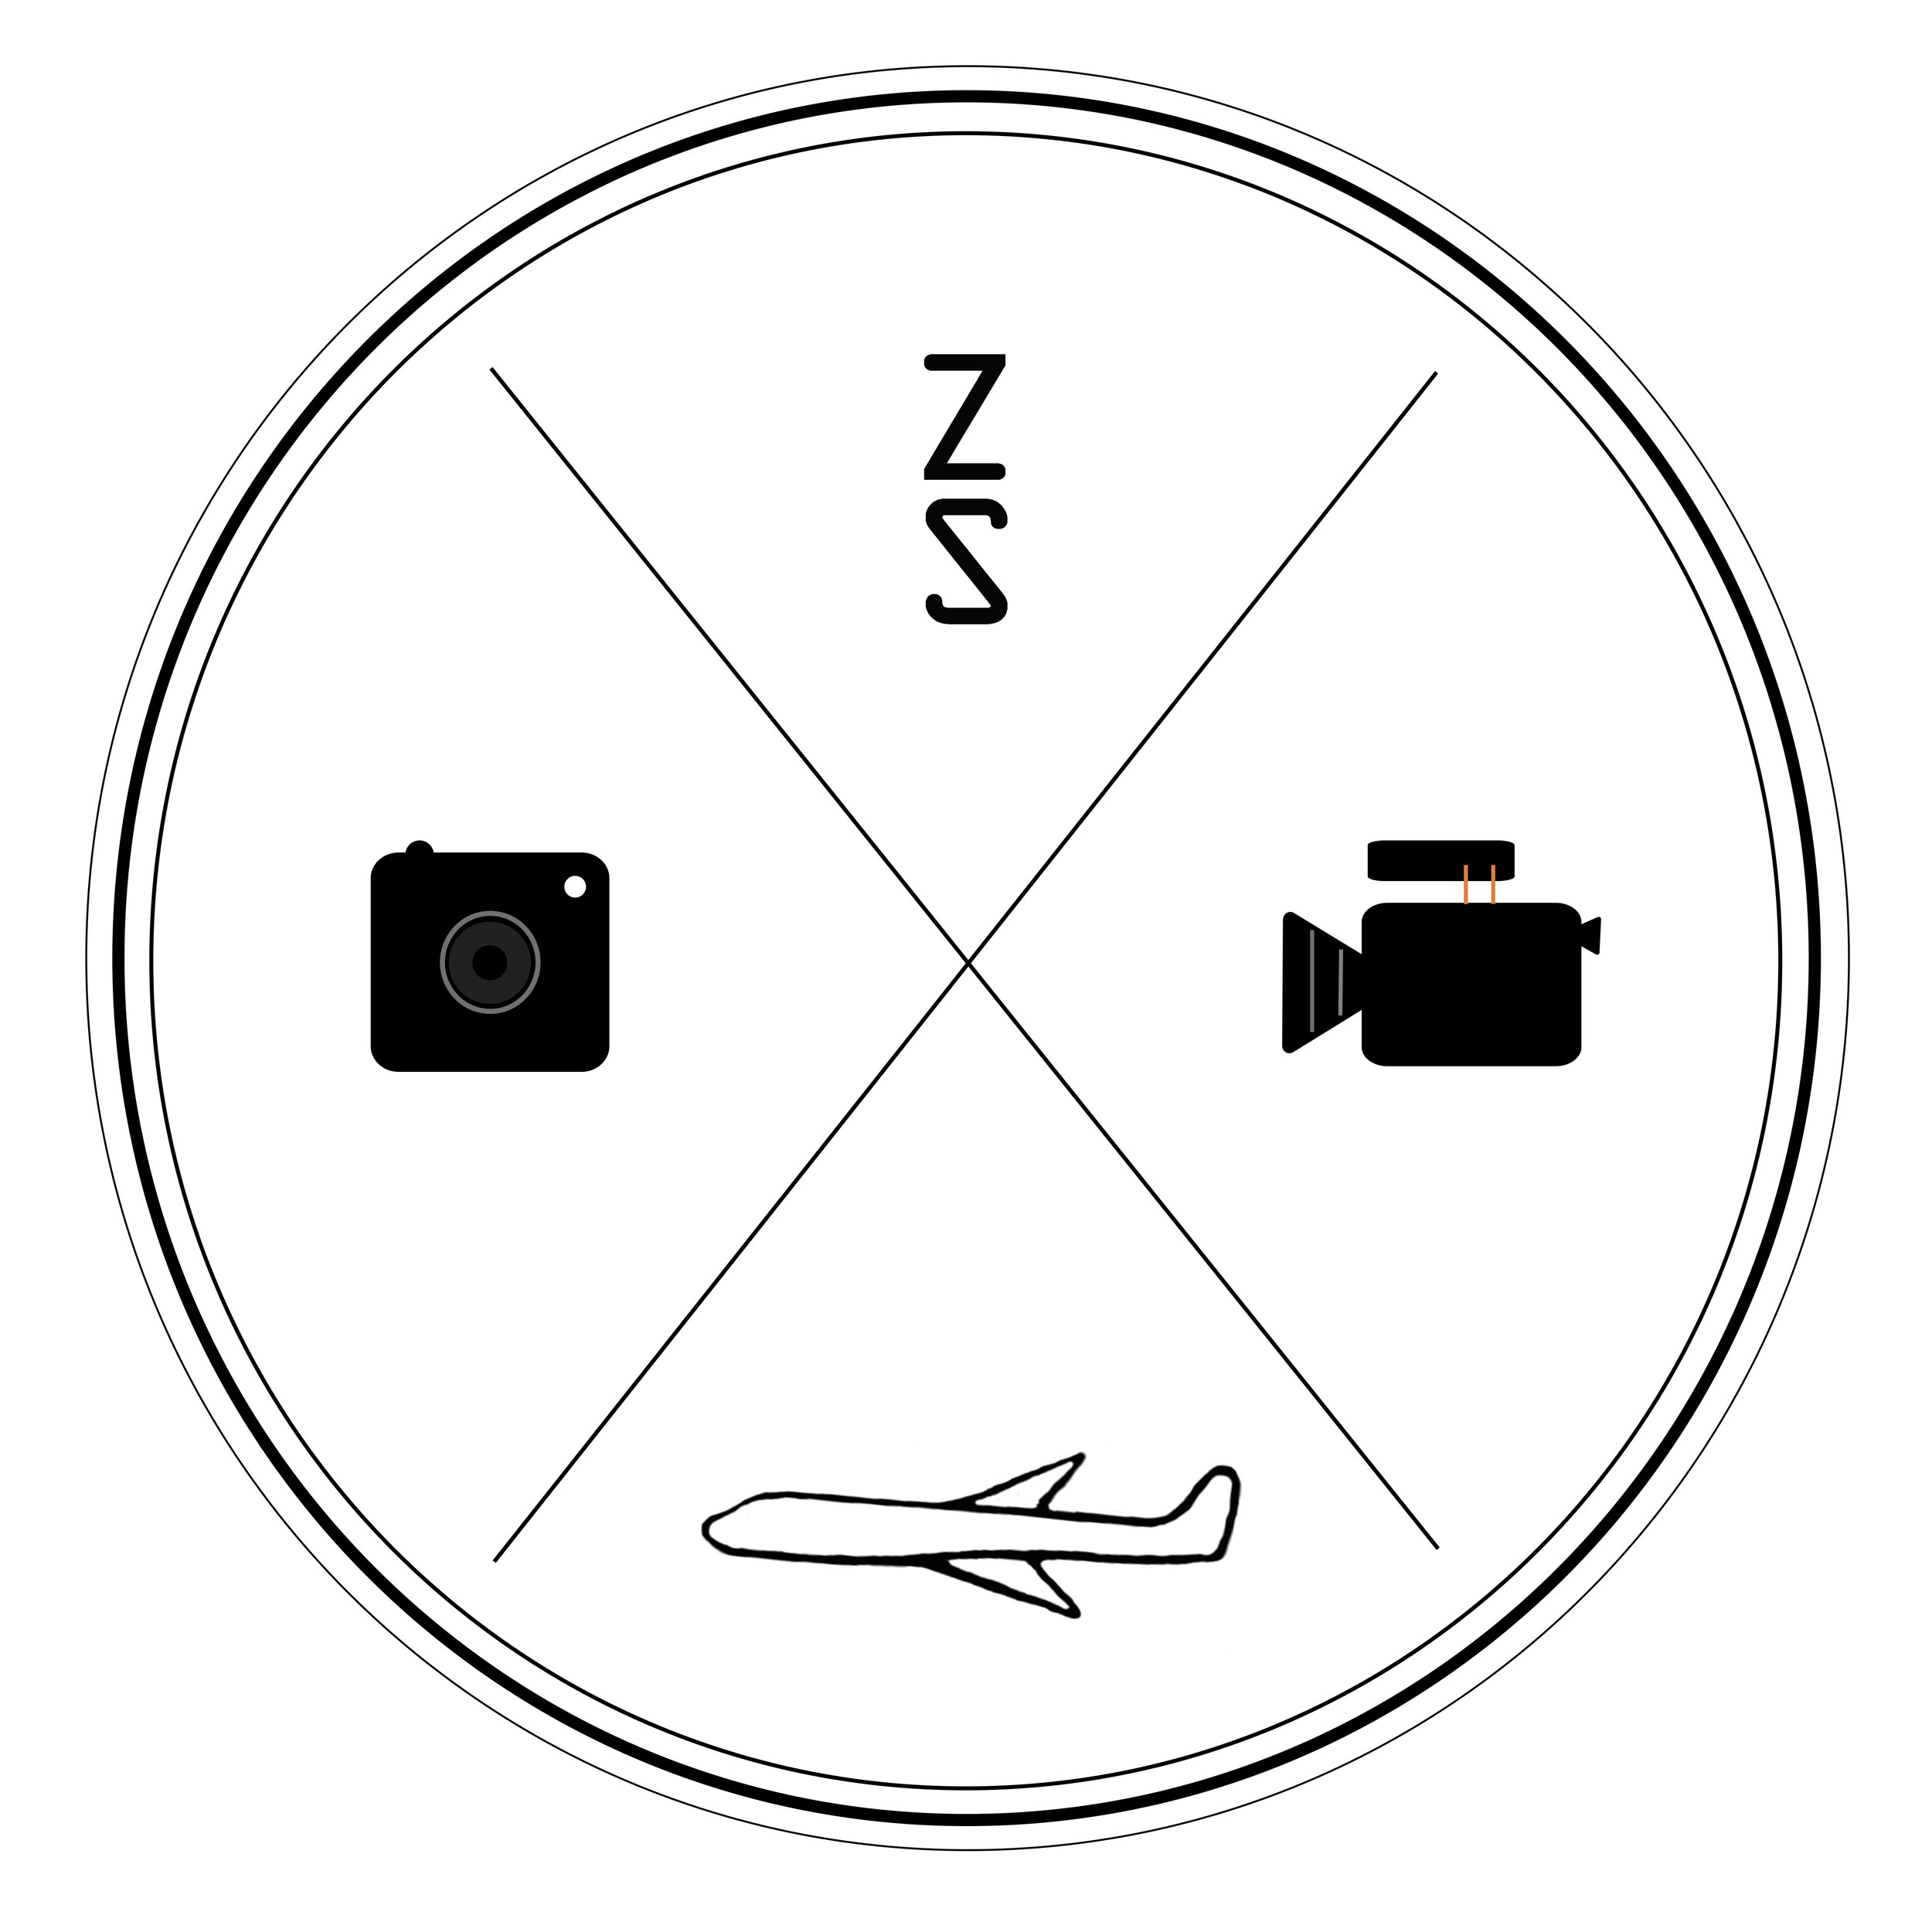 ZS logo 17v3.jpg